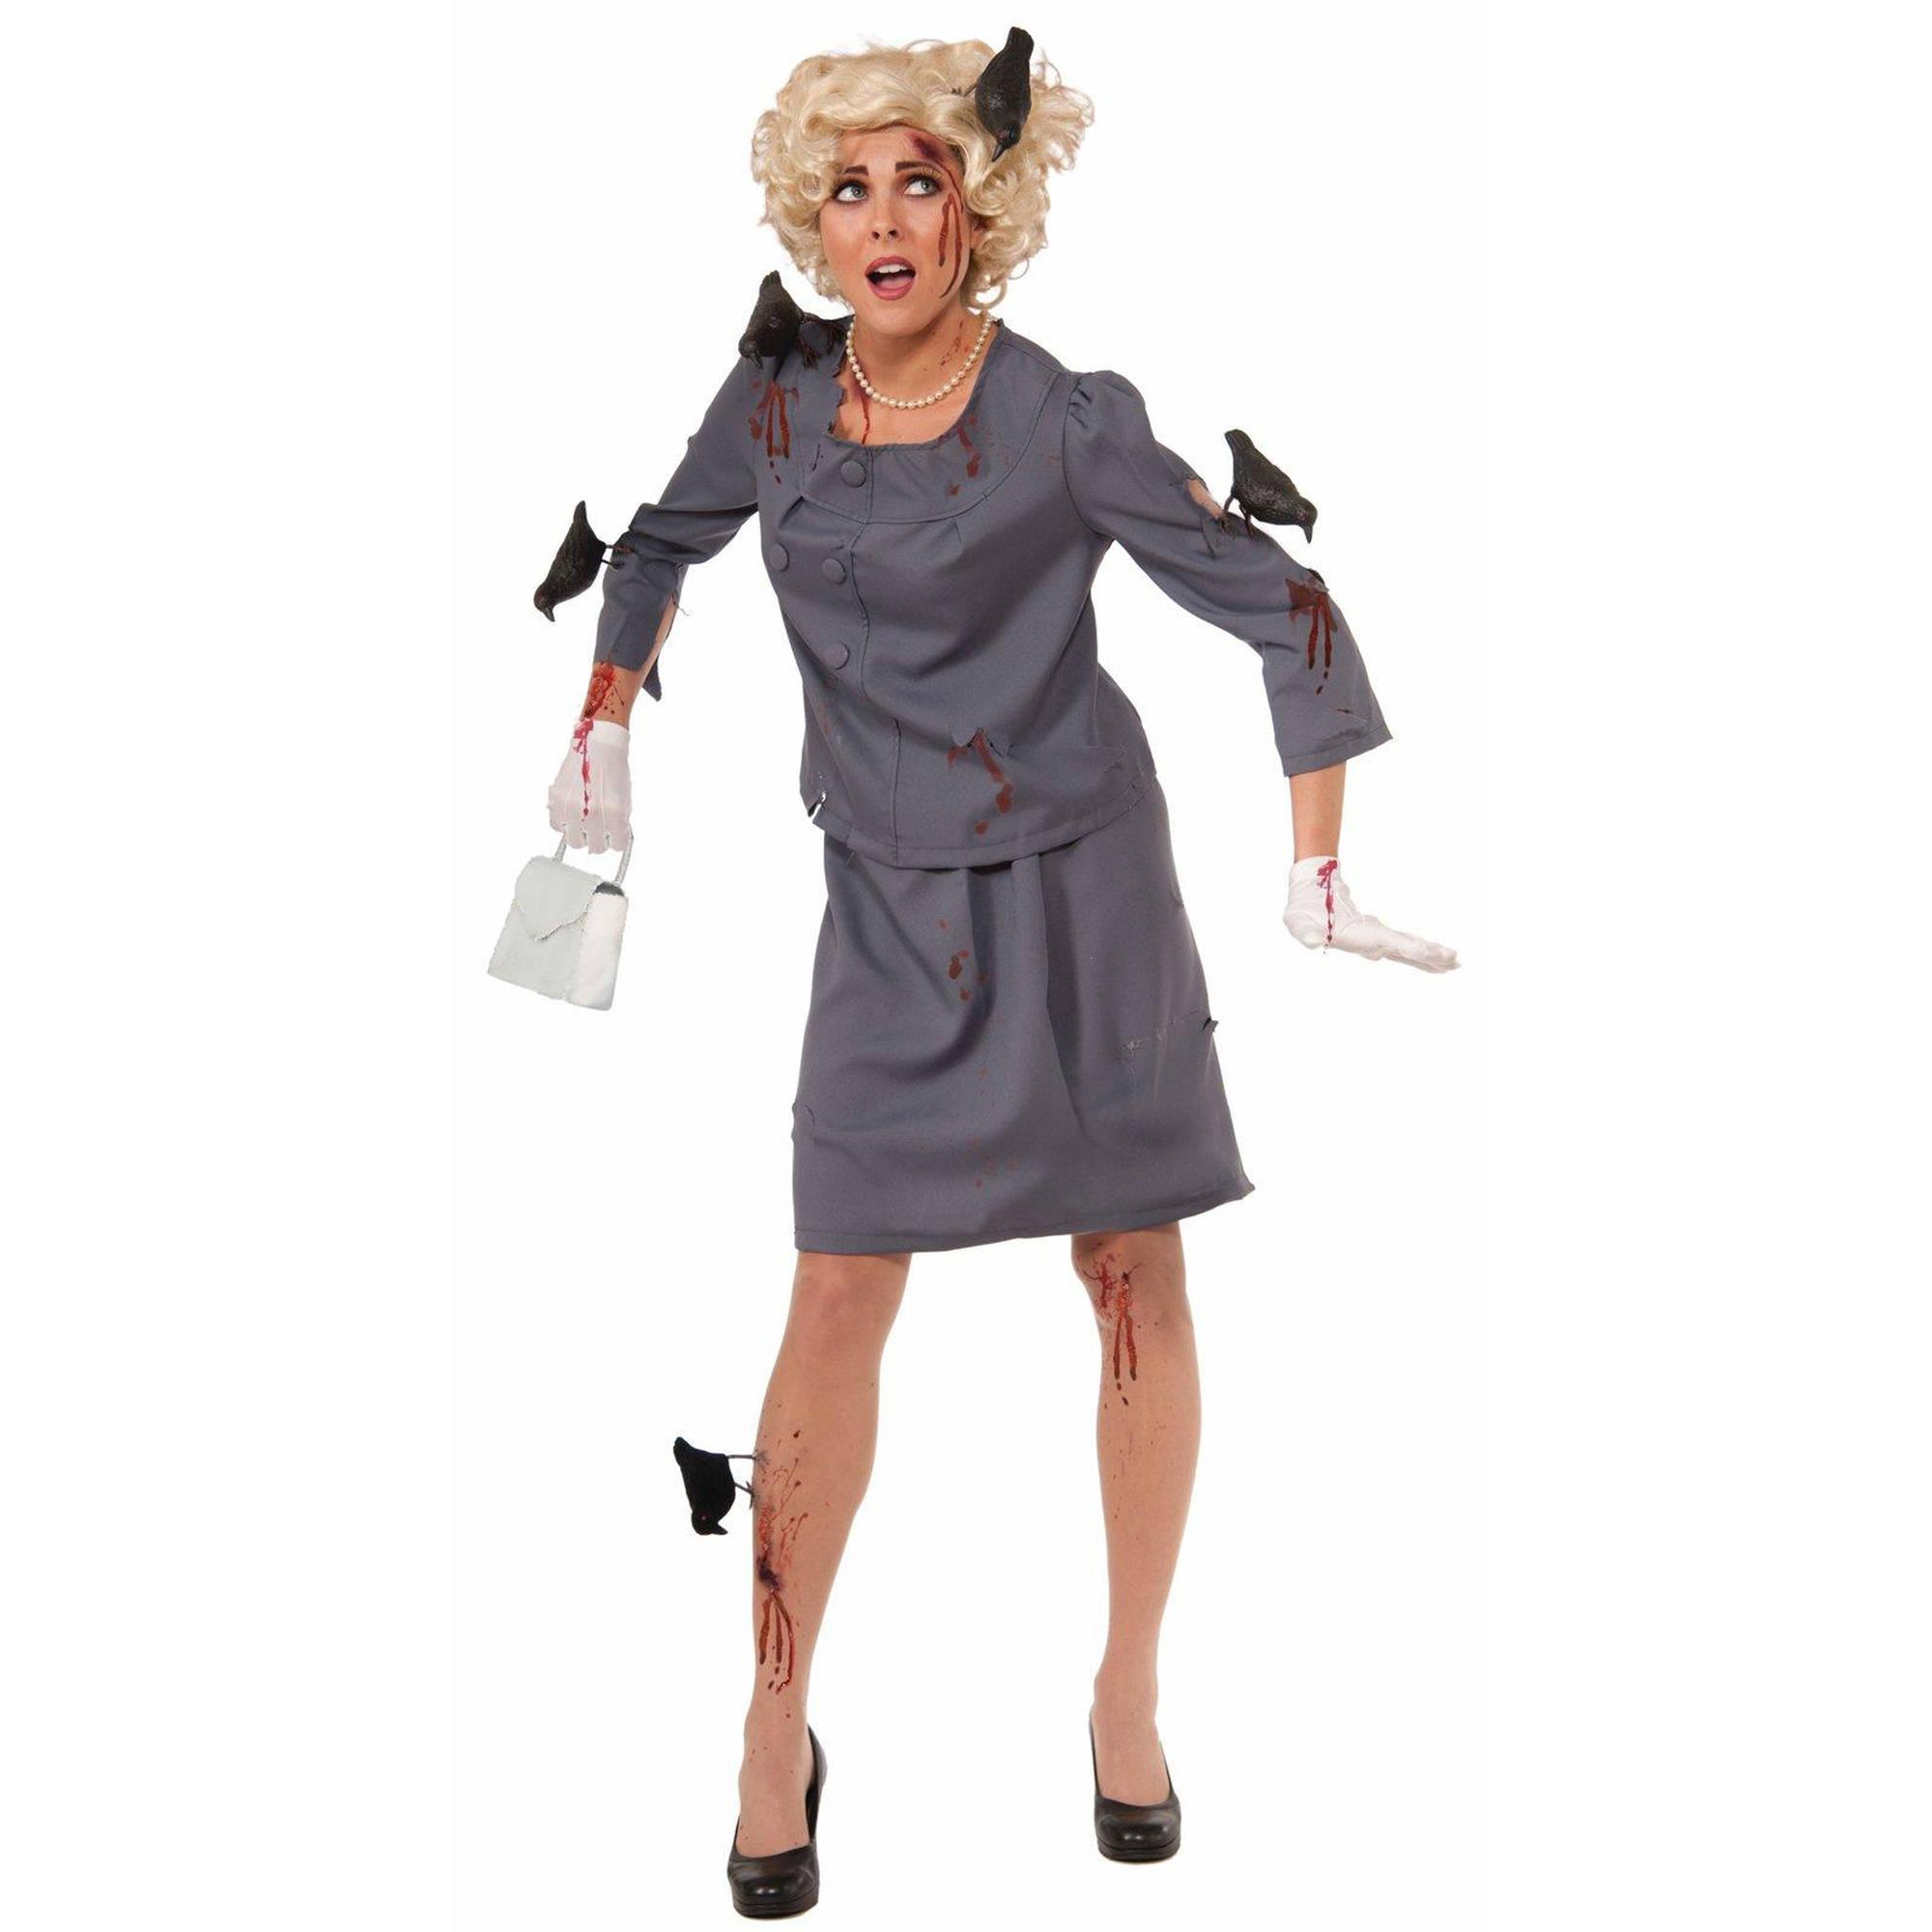 Bird Attack Women's Adult Halloween Costume, 1 Size